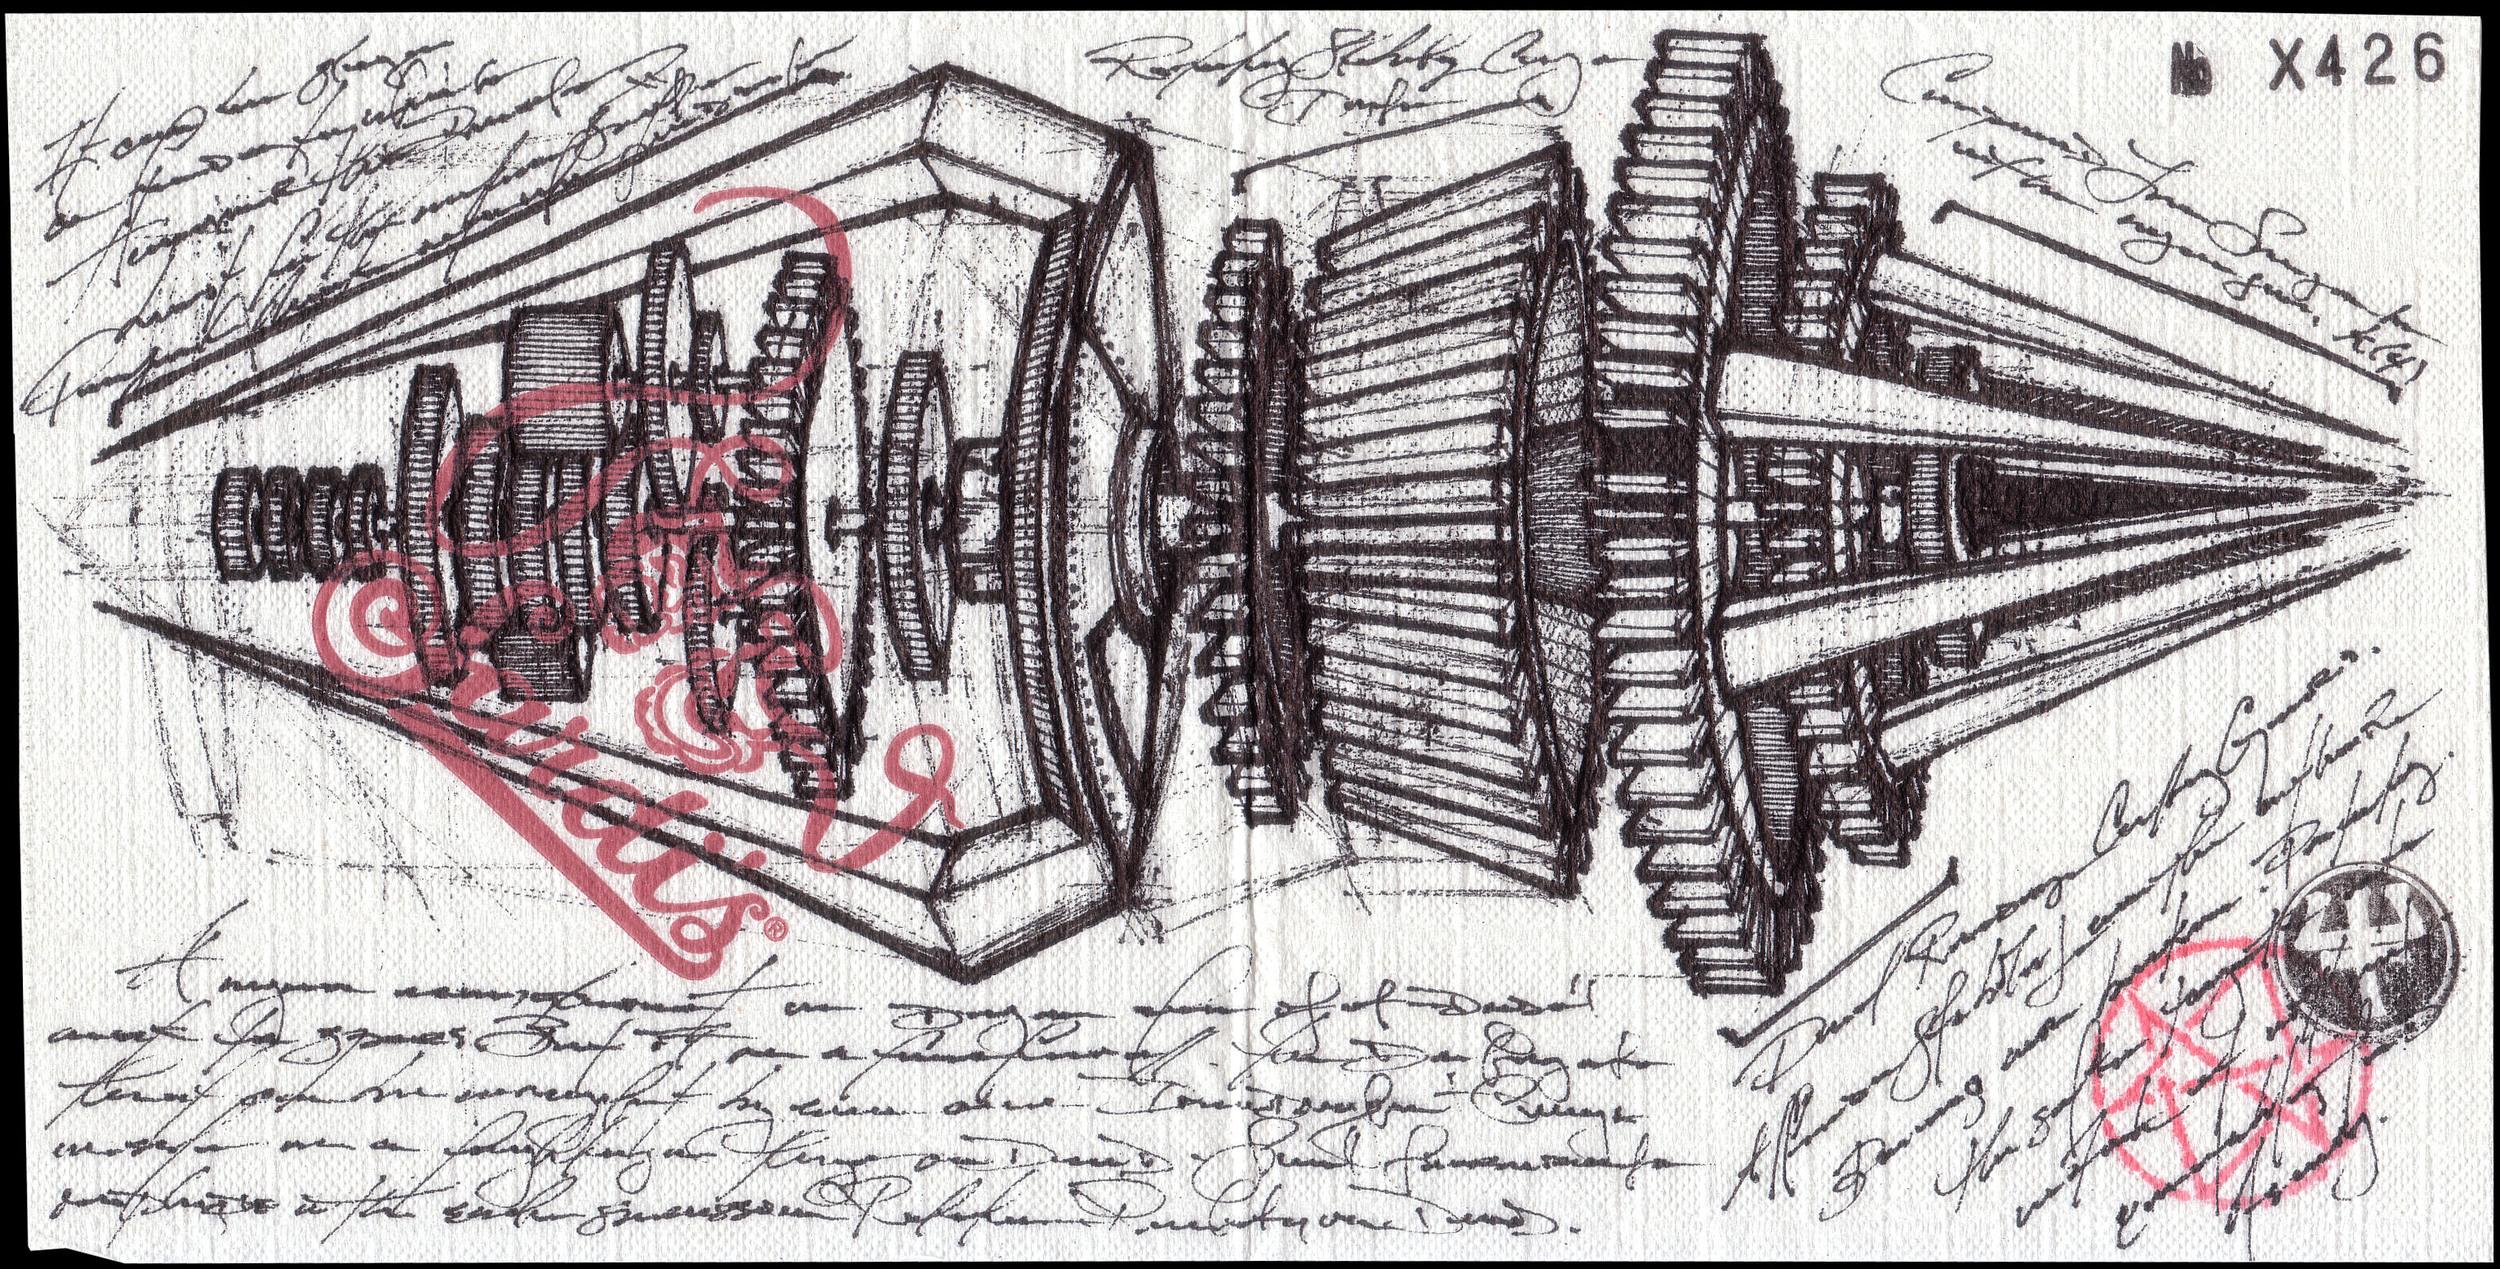 Clockwork Atomic x426